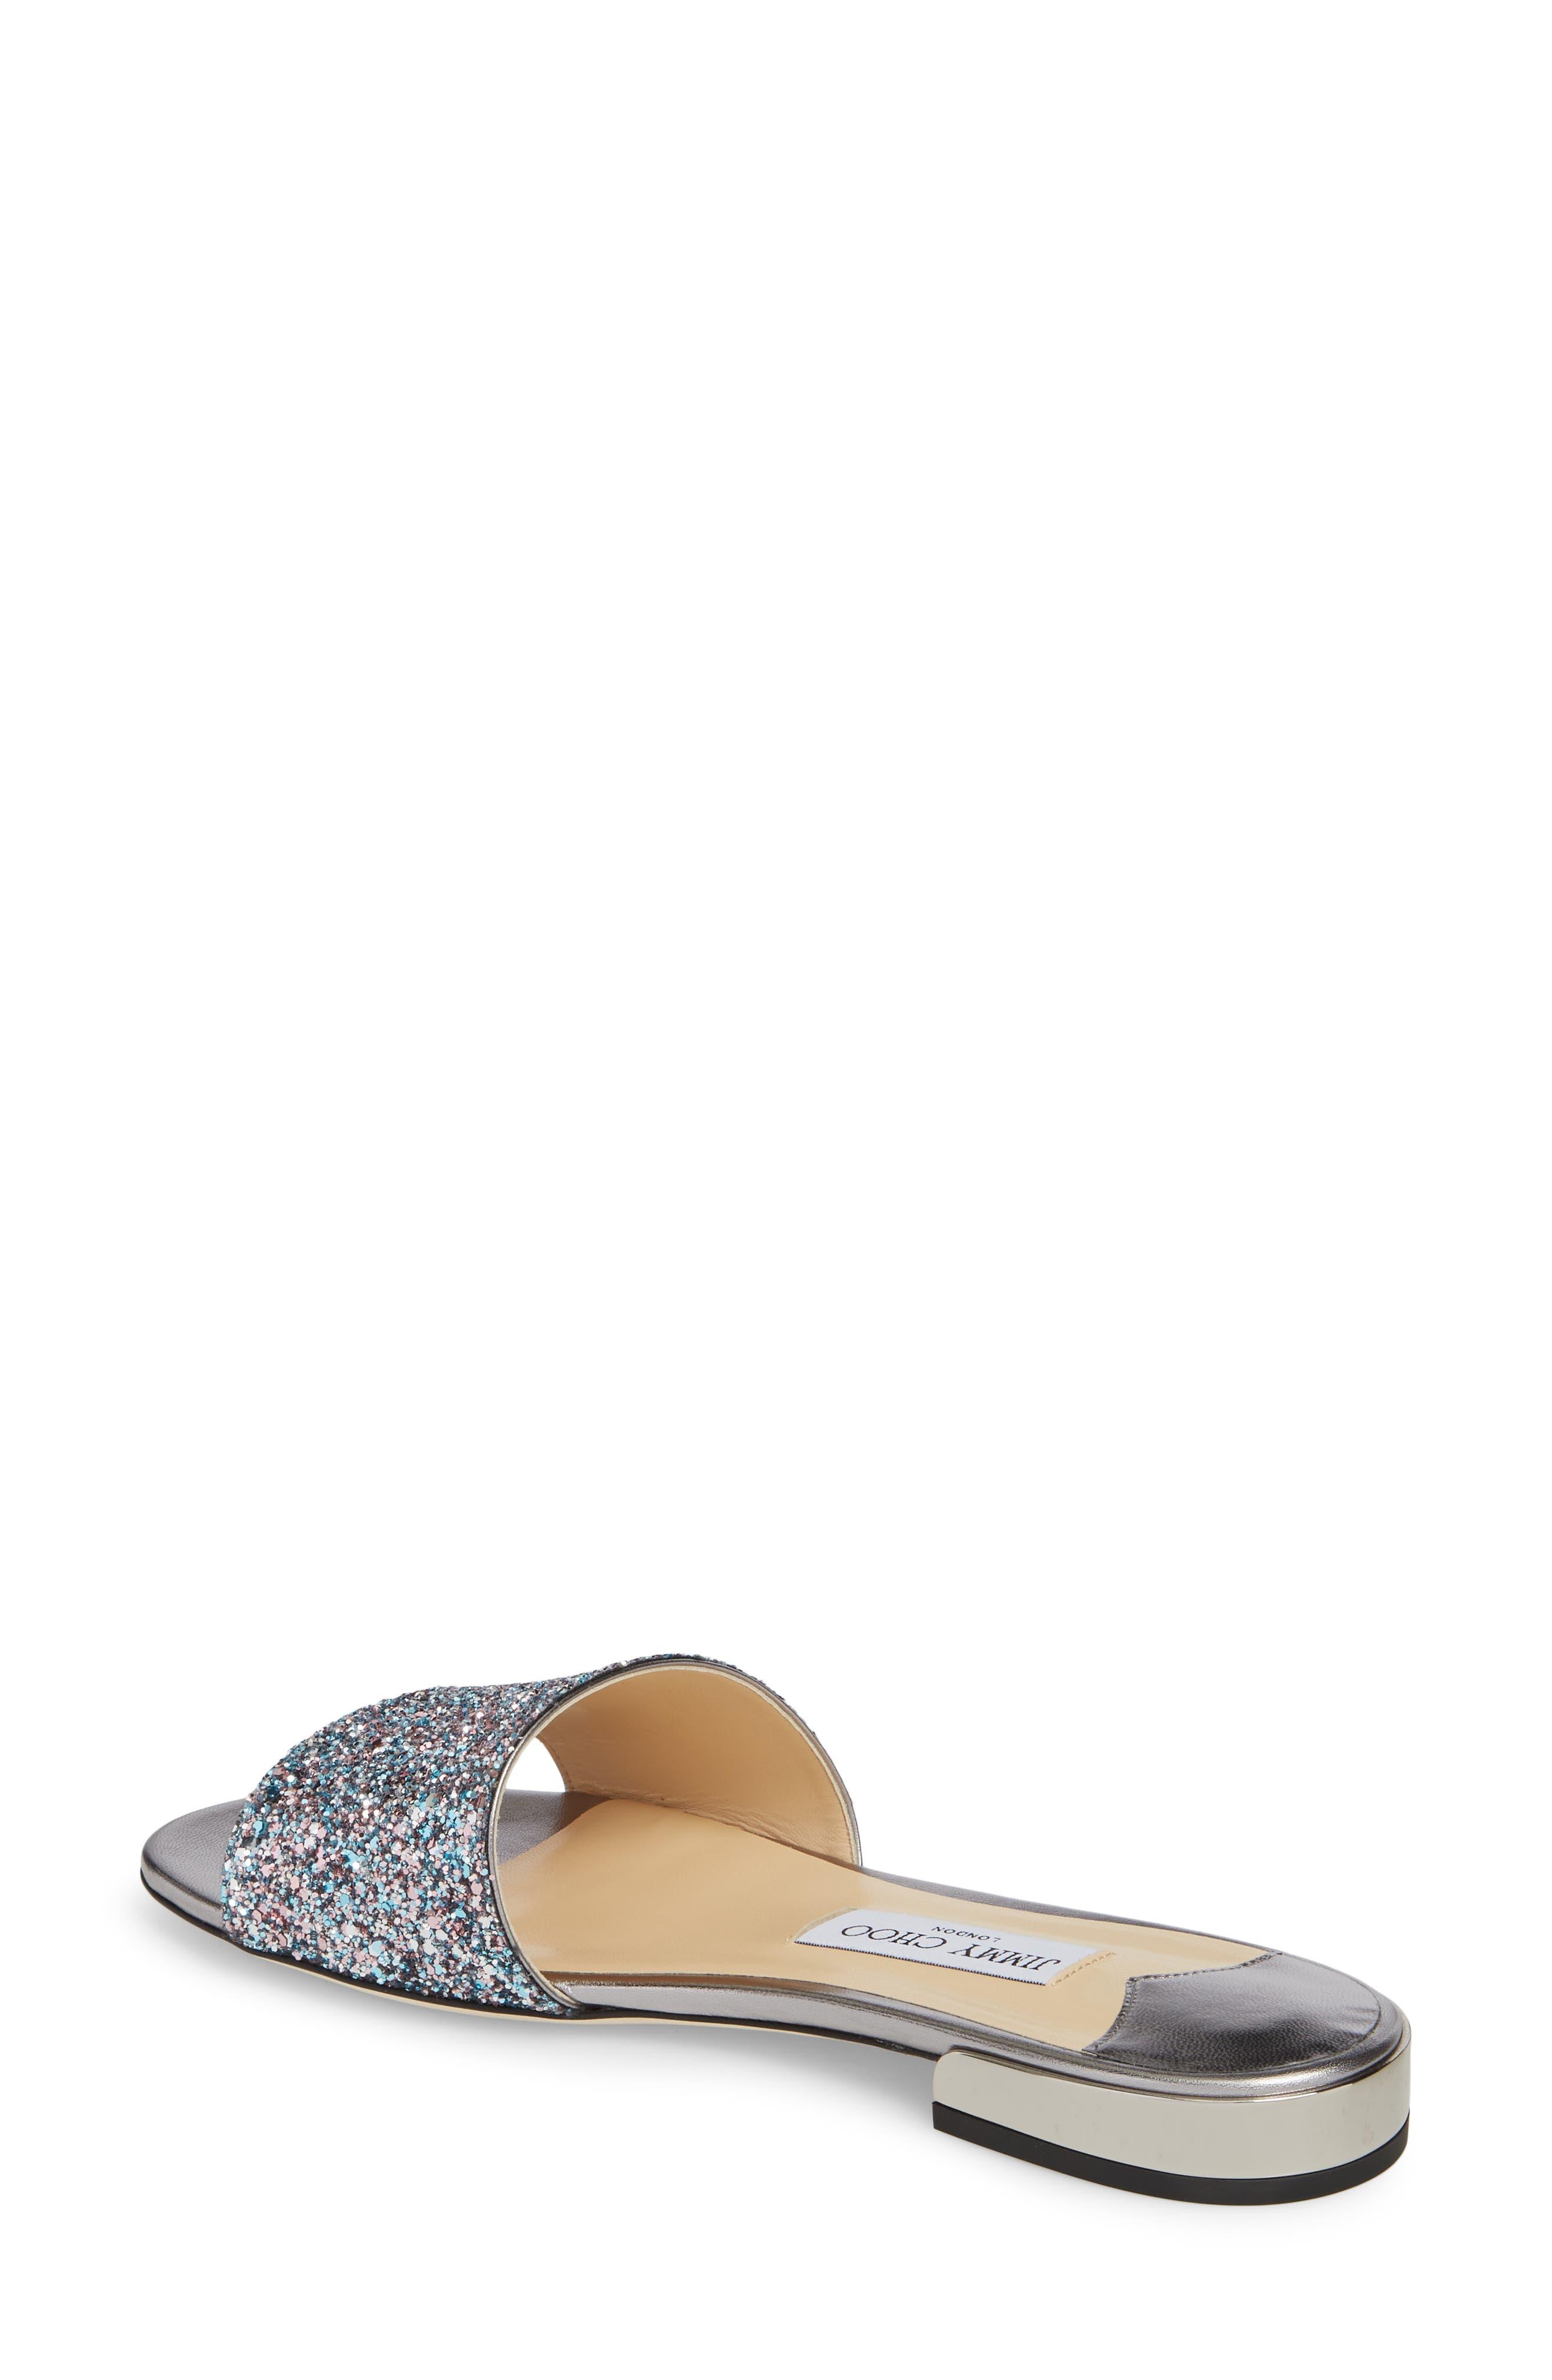 JIMMY CHOO Joni Flat Navy Metallic Tweed Slides, Blush Silver